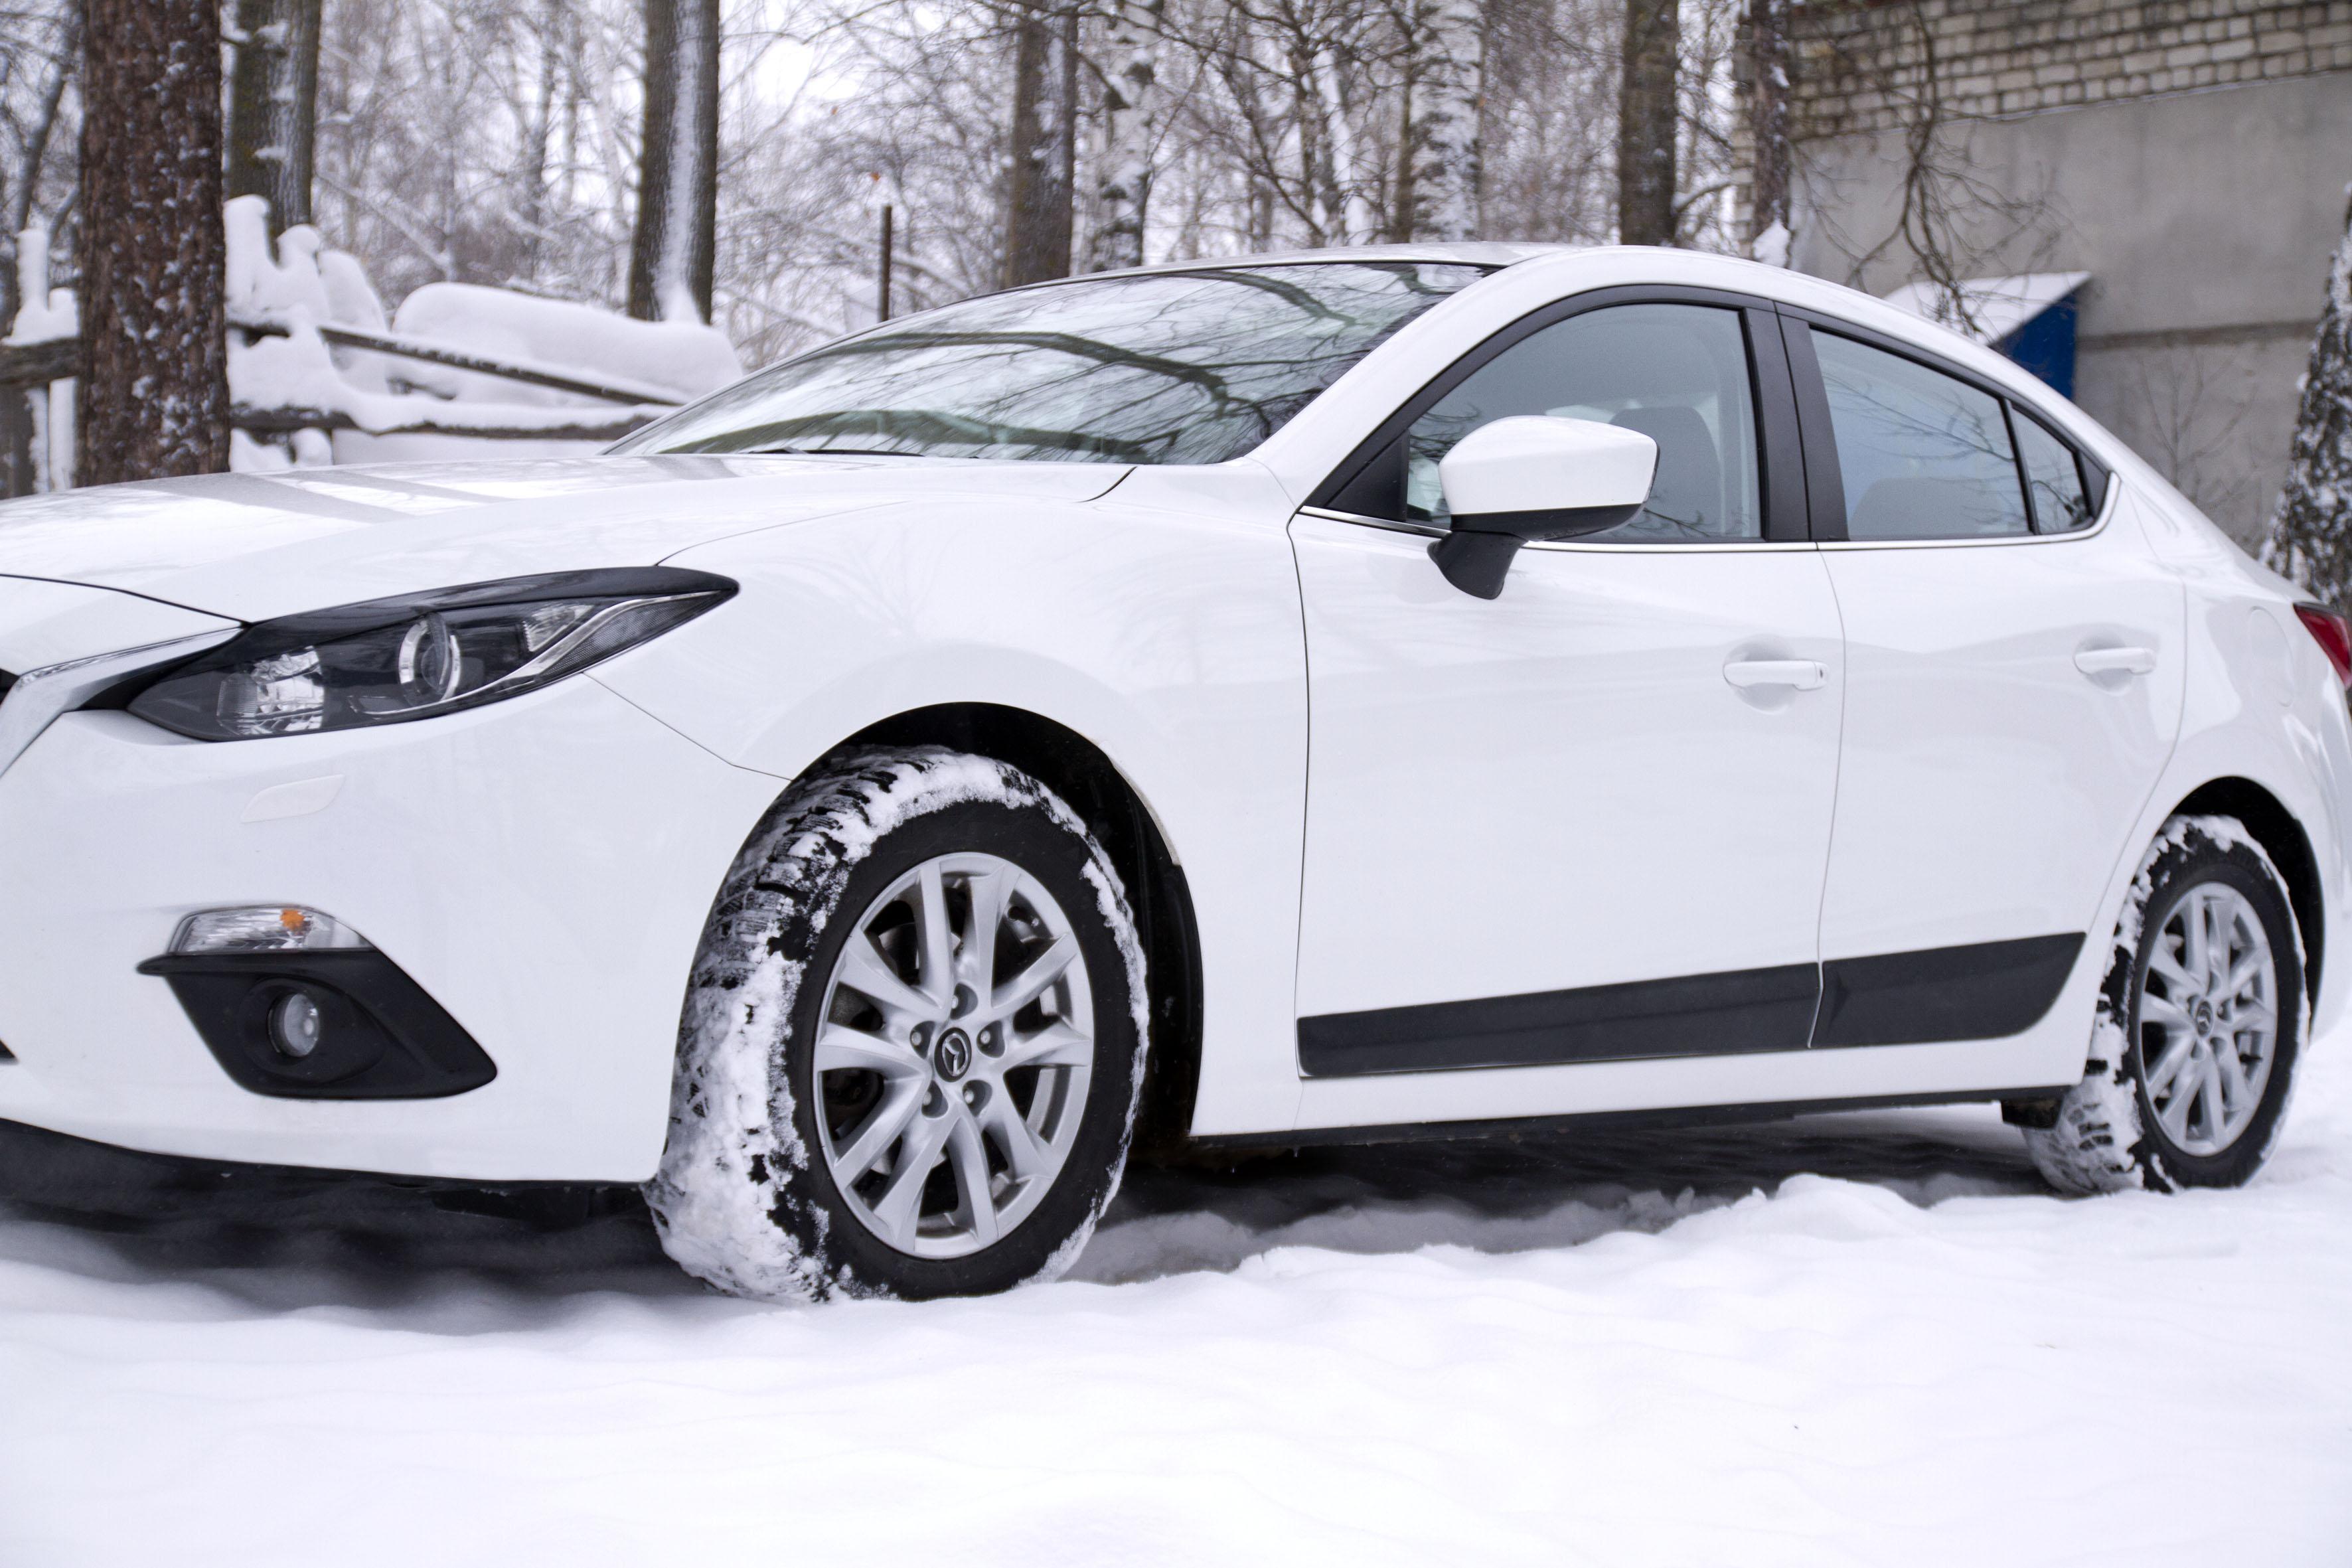 Молдинги на двери Mazda 3 седан 2013- MM-076300